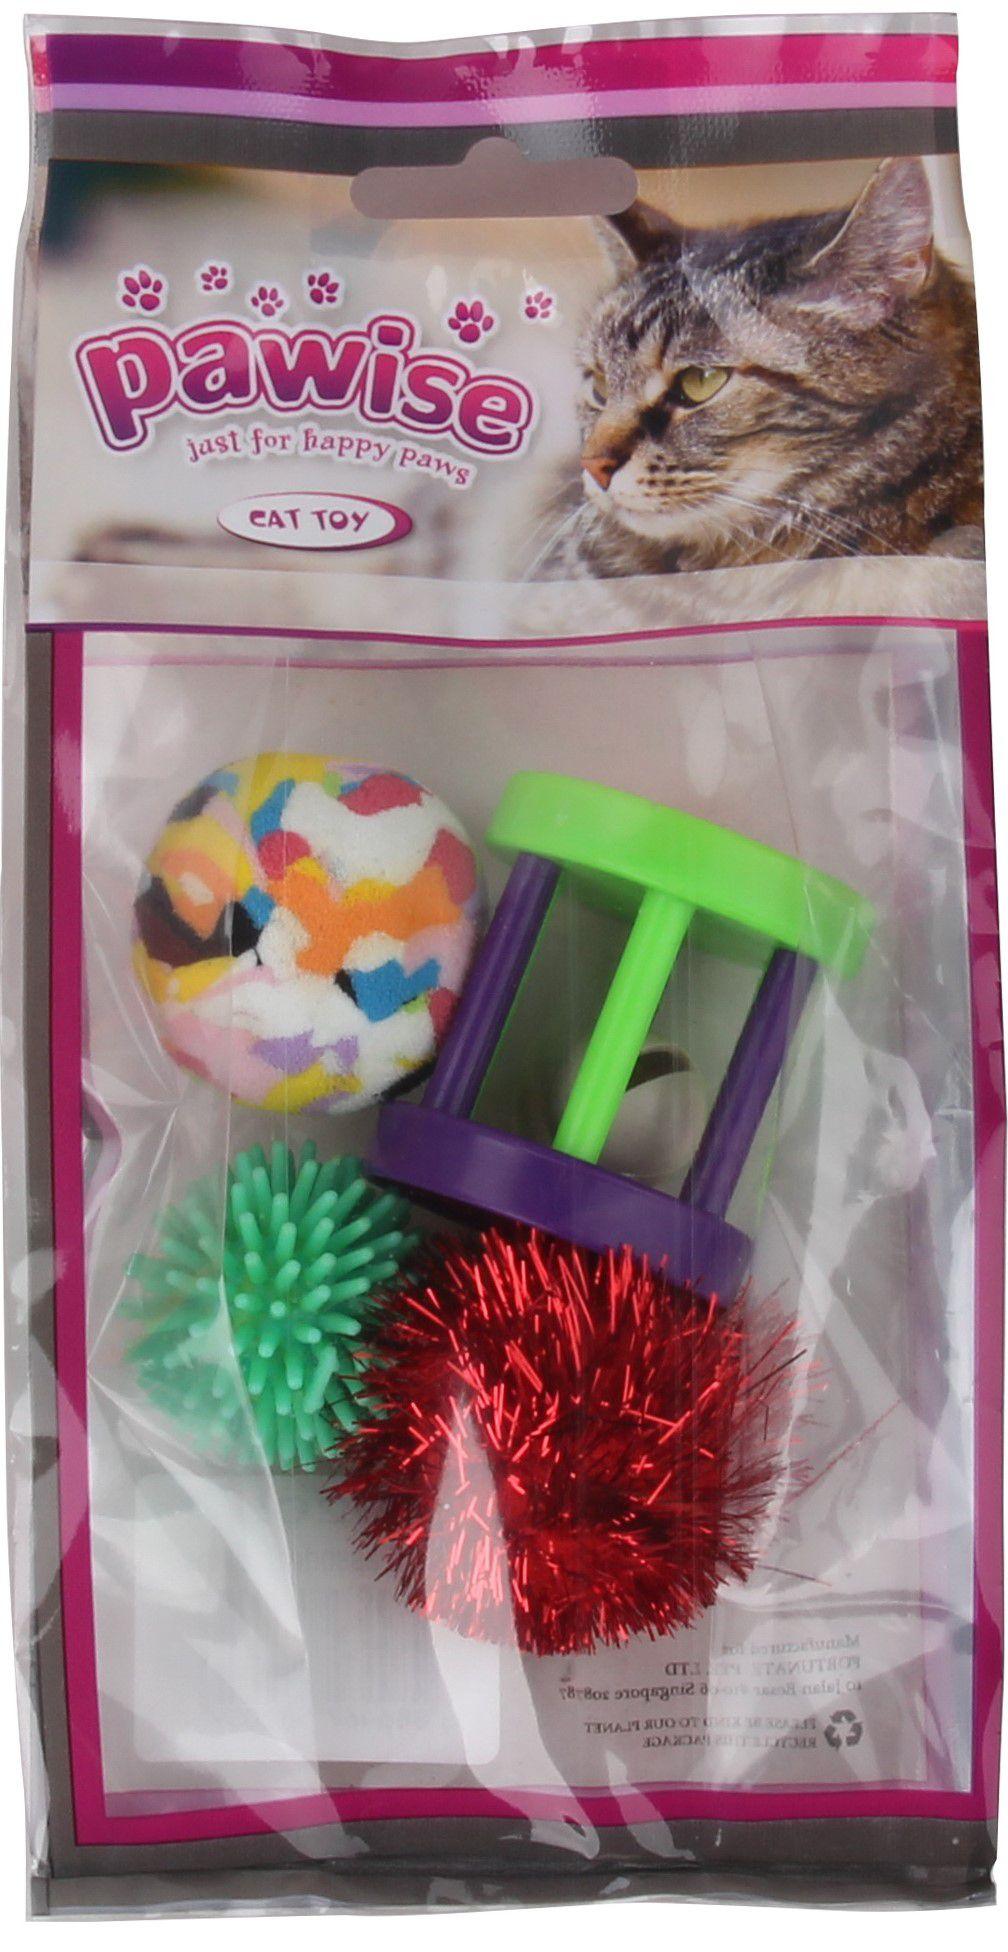 Kit 5 Brinquedos Varinha e Pack c/ 4 Bolas p/ Gato  Pawise